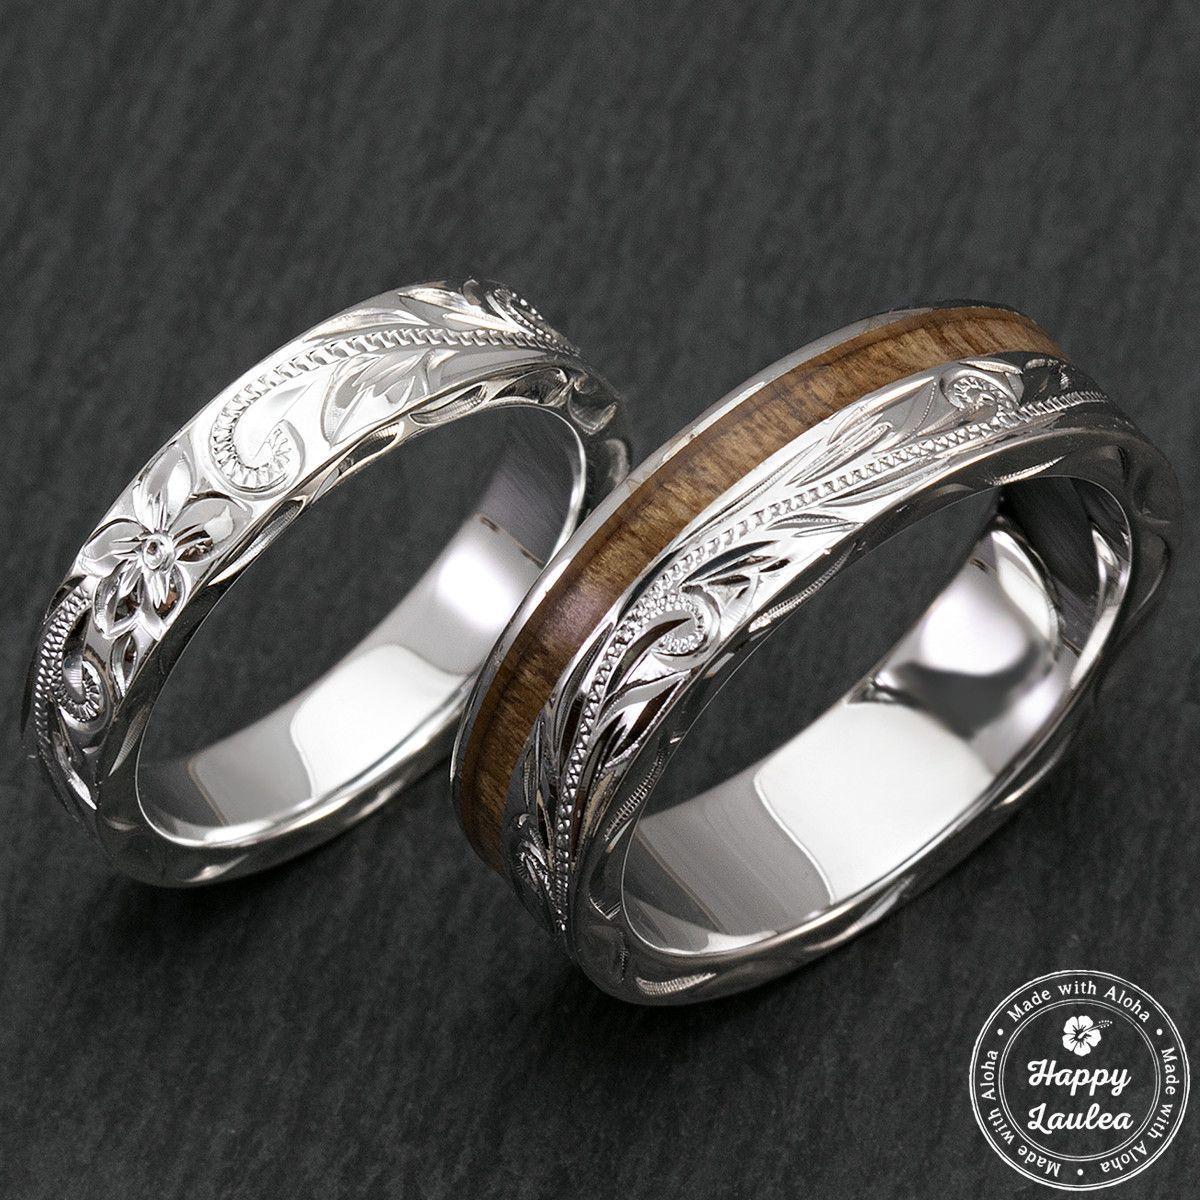 Sterling silver hawaiian jewelry couplewedding ring set with koa